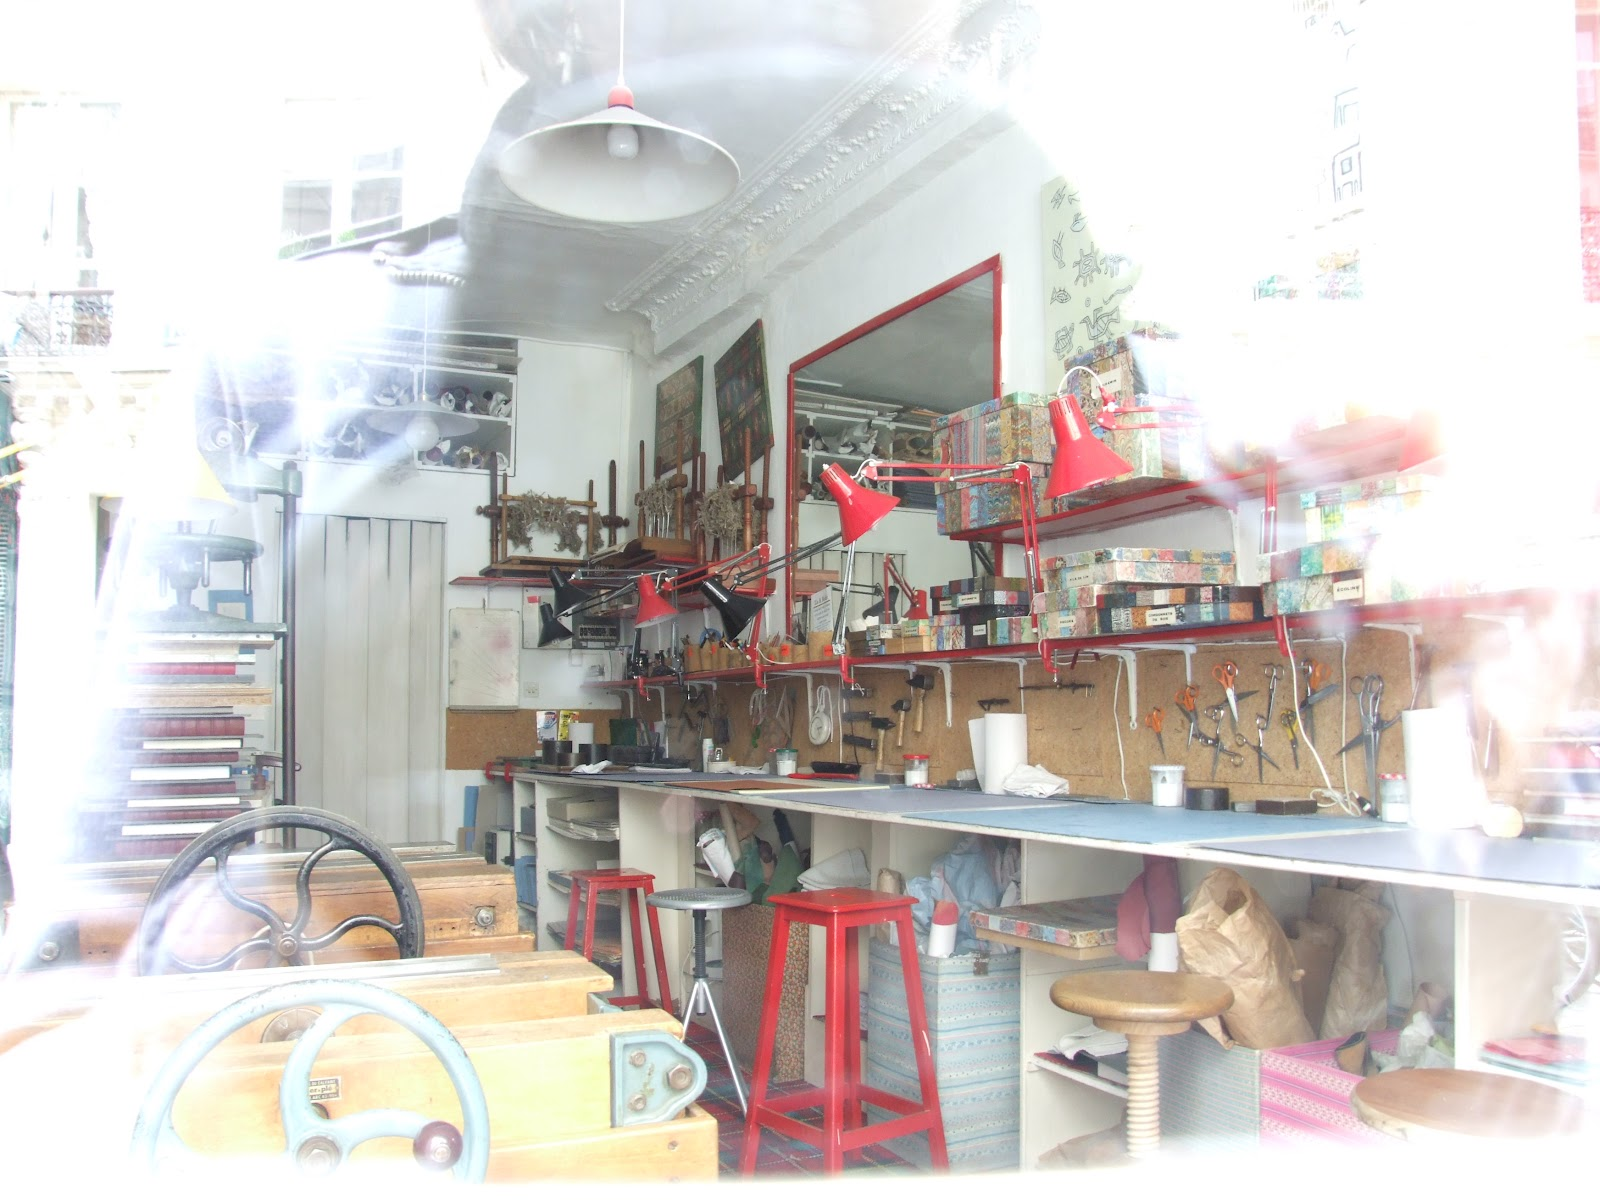 Amanda watson will atelier du marais traditional - Atelier du marais agencement ...